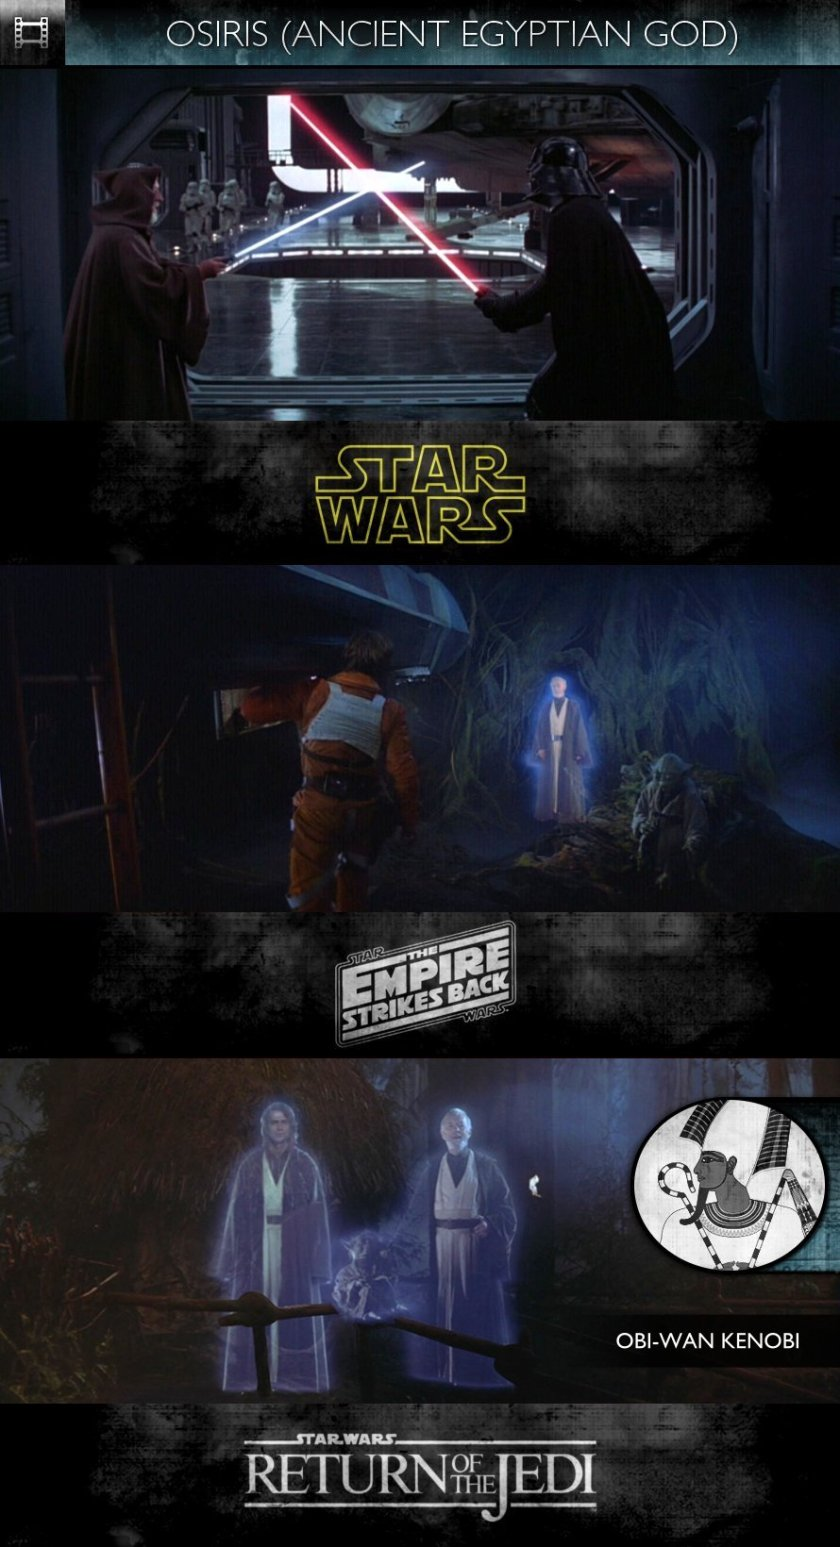 OSIRIS - Star Wars: Original Trilogy (1977-1983) - Obi-Wan Kenobi